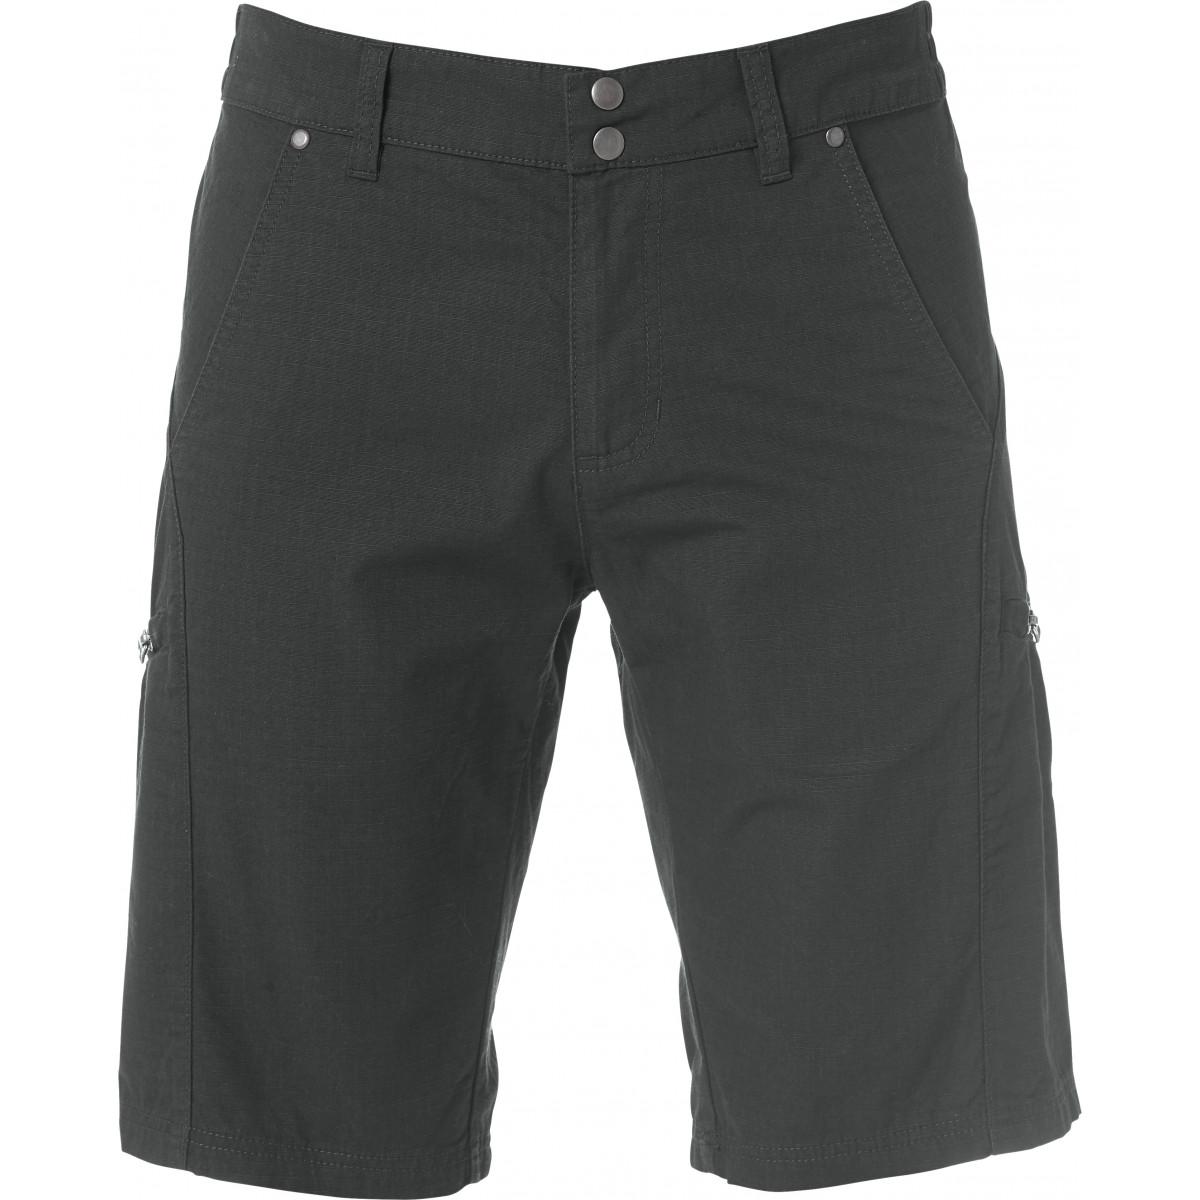 Брюки унисекс 022029 Zip-Pocket Shorts - Темно-серый